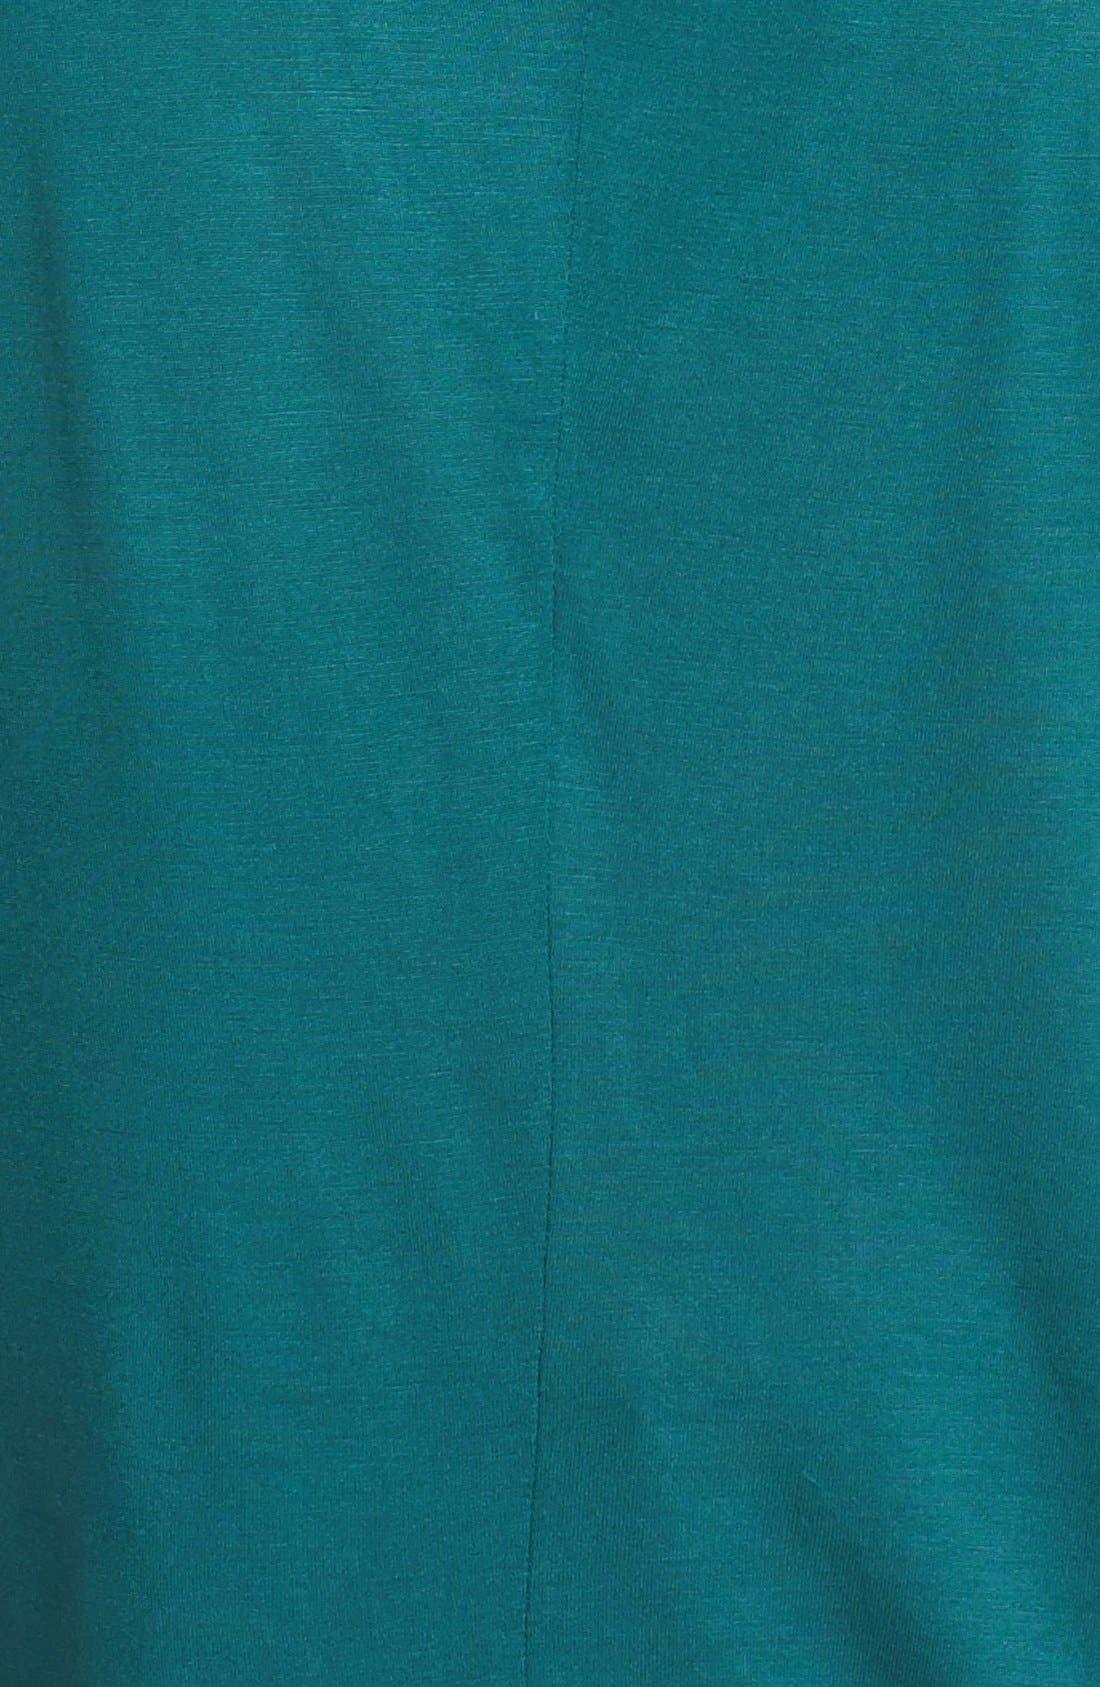 Alternate Image 3  - Halogen® Slit Back Mixed Media Top (Petite)